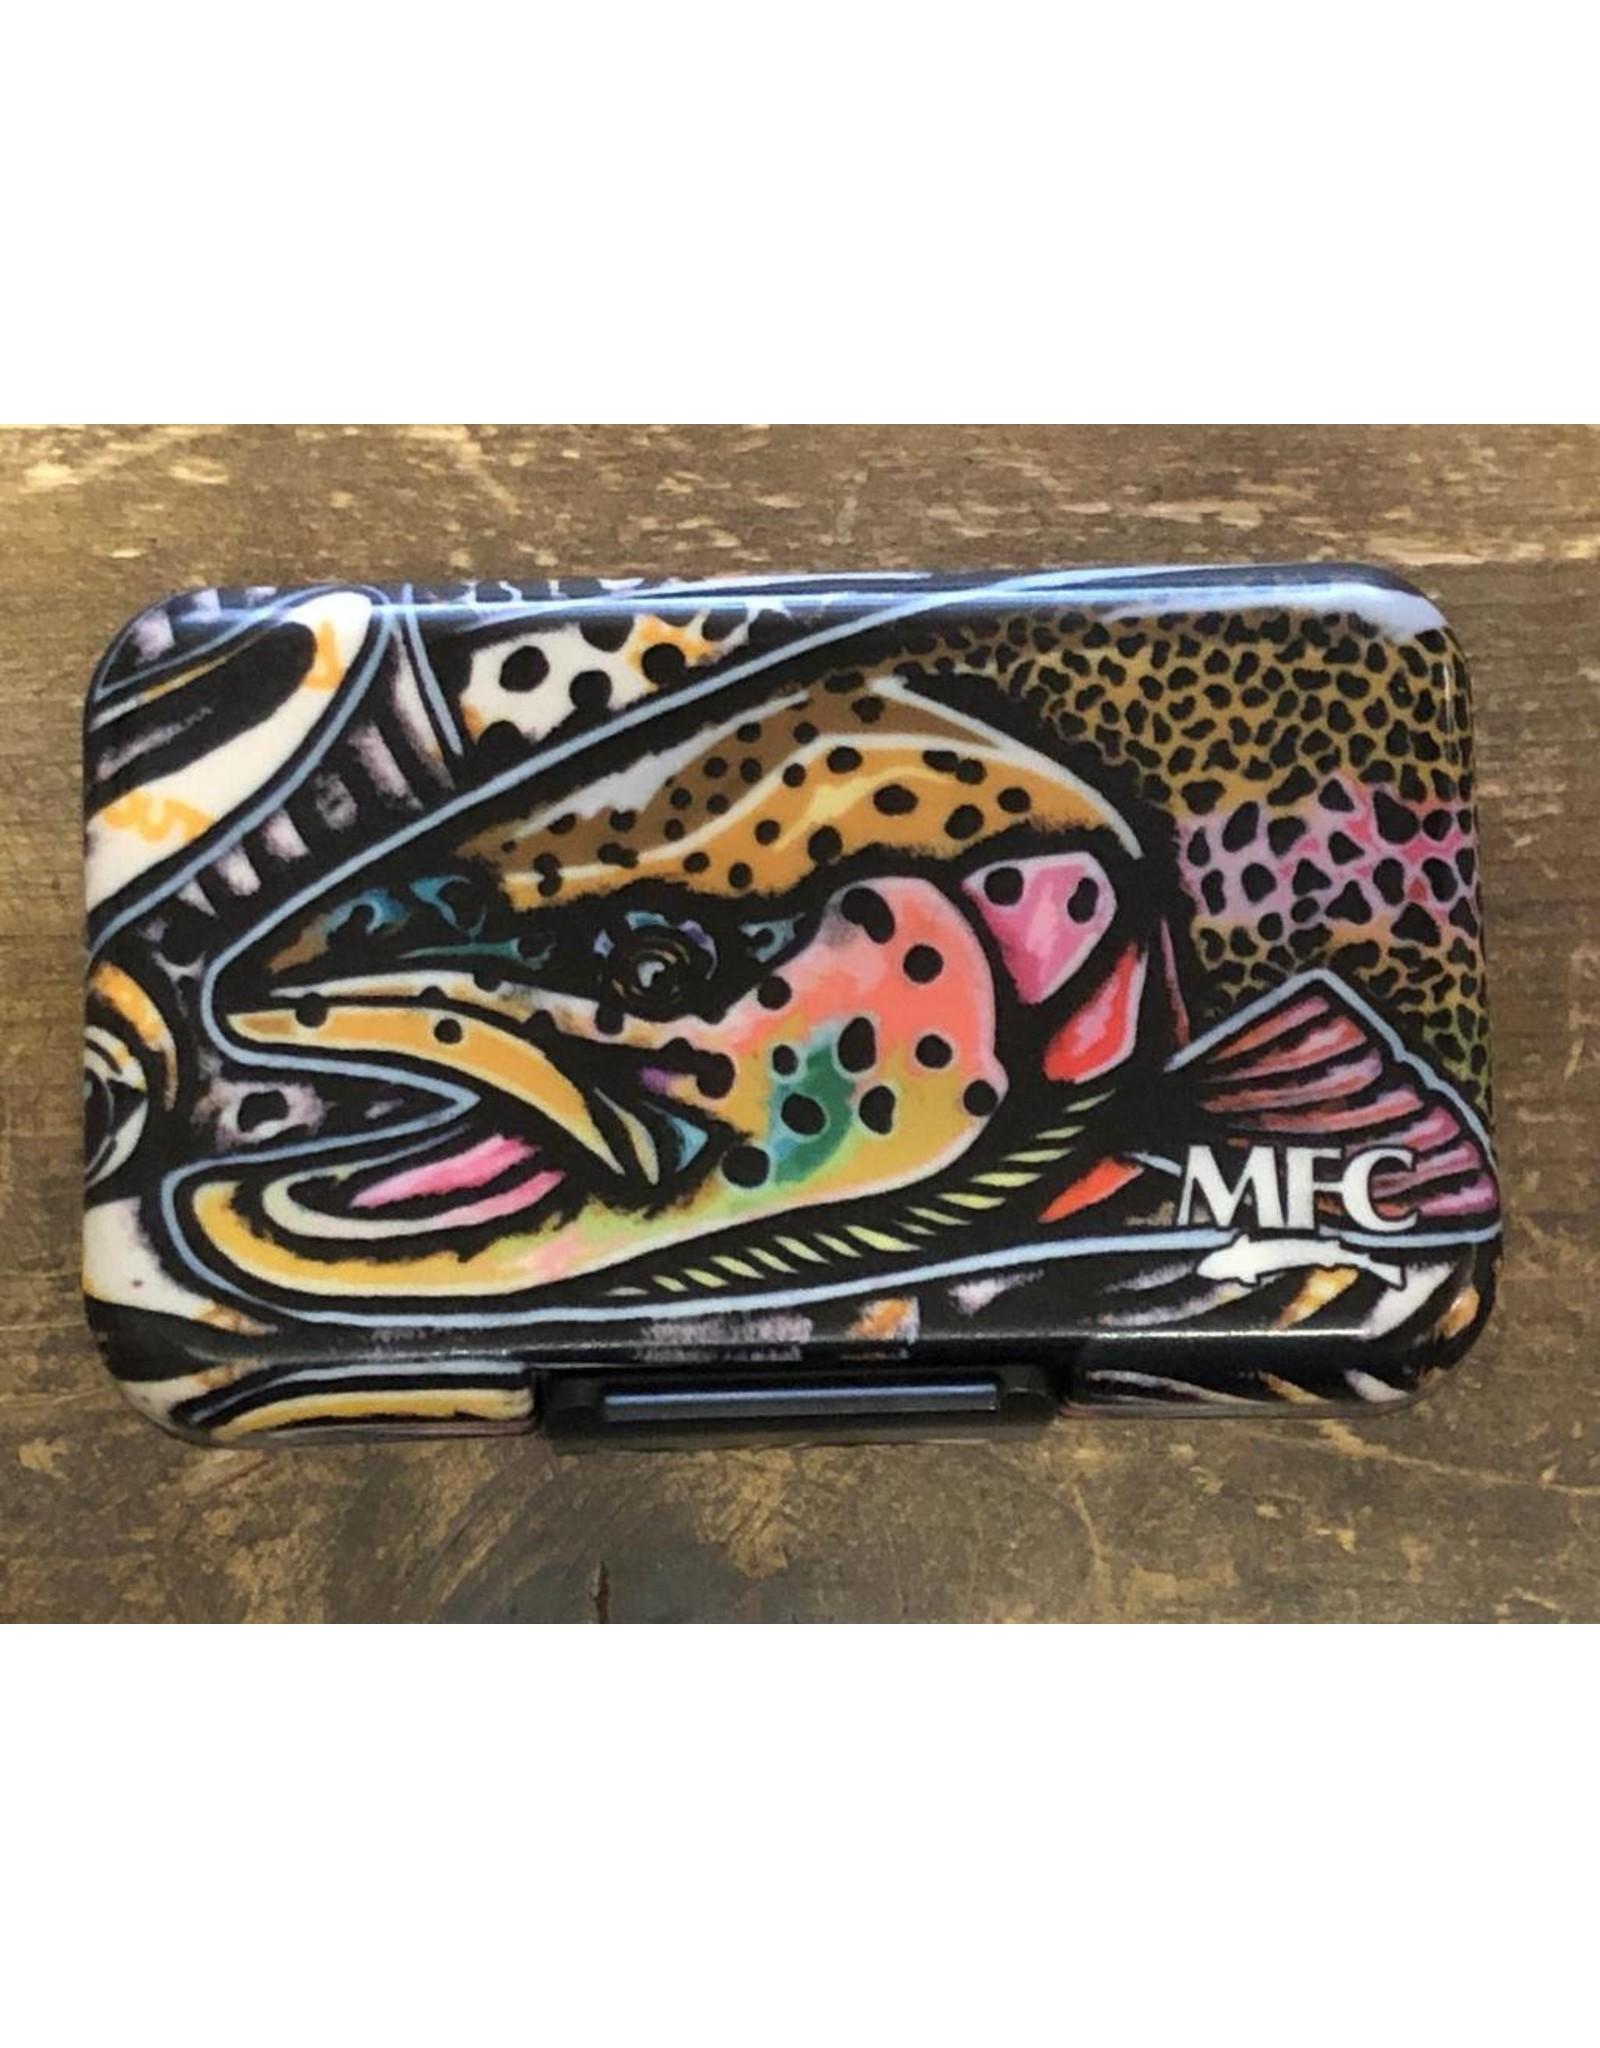 MFC MFC Poly Fly Box- Estrada's Rainbow